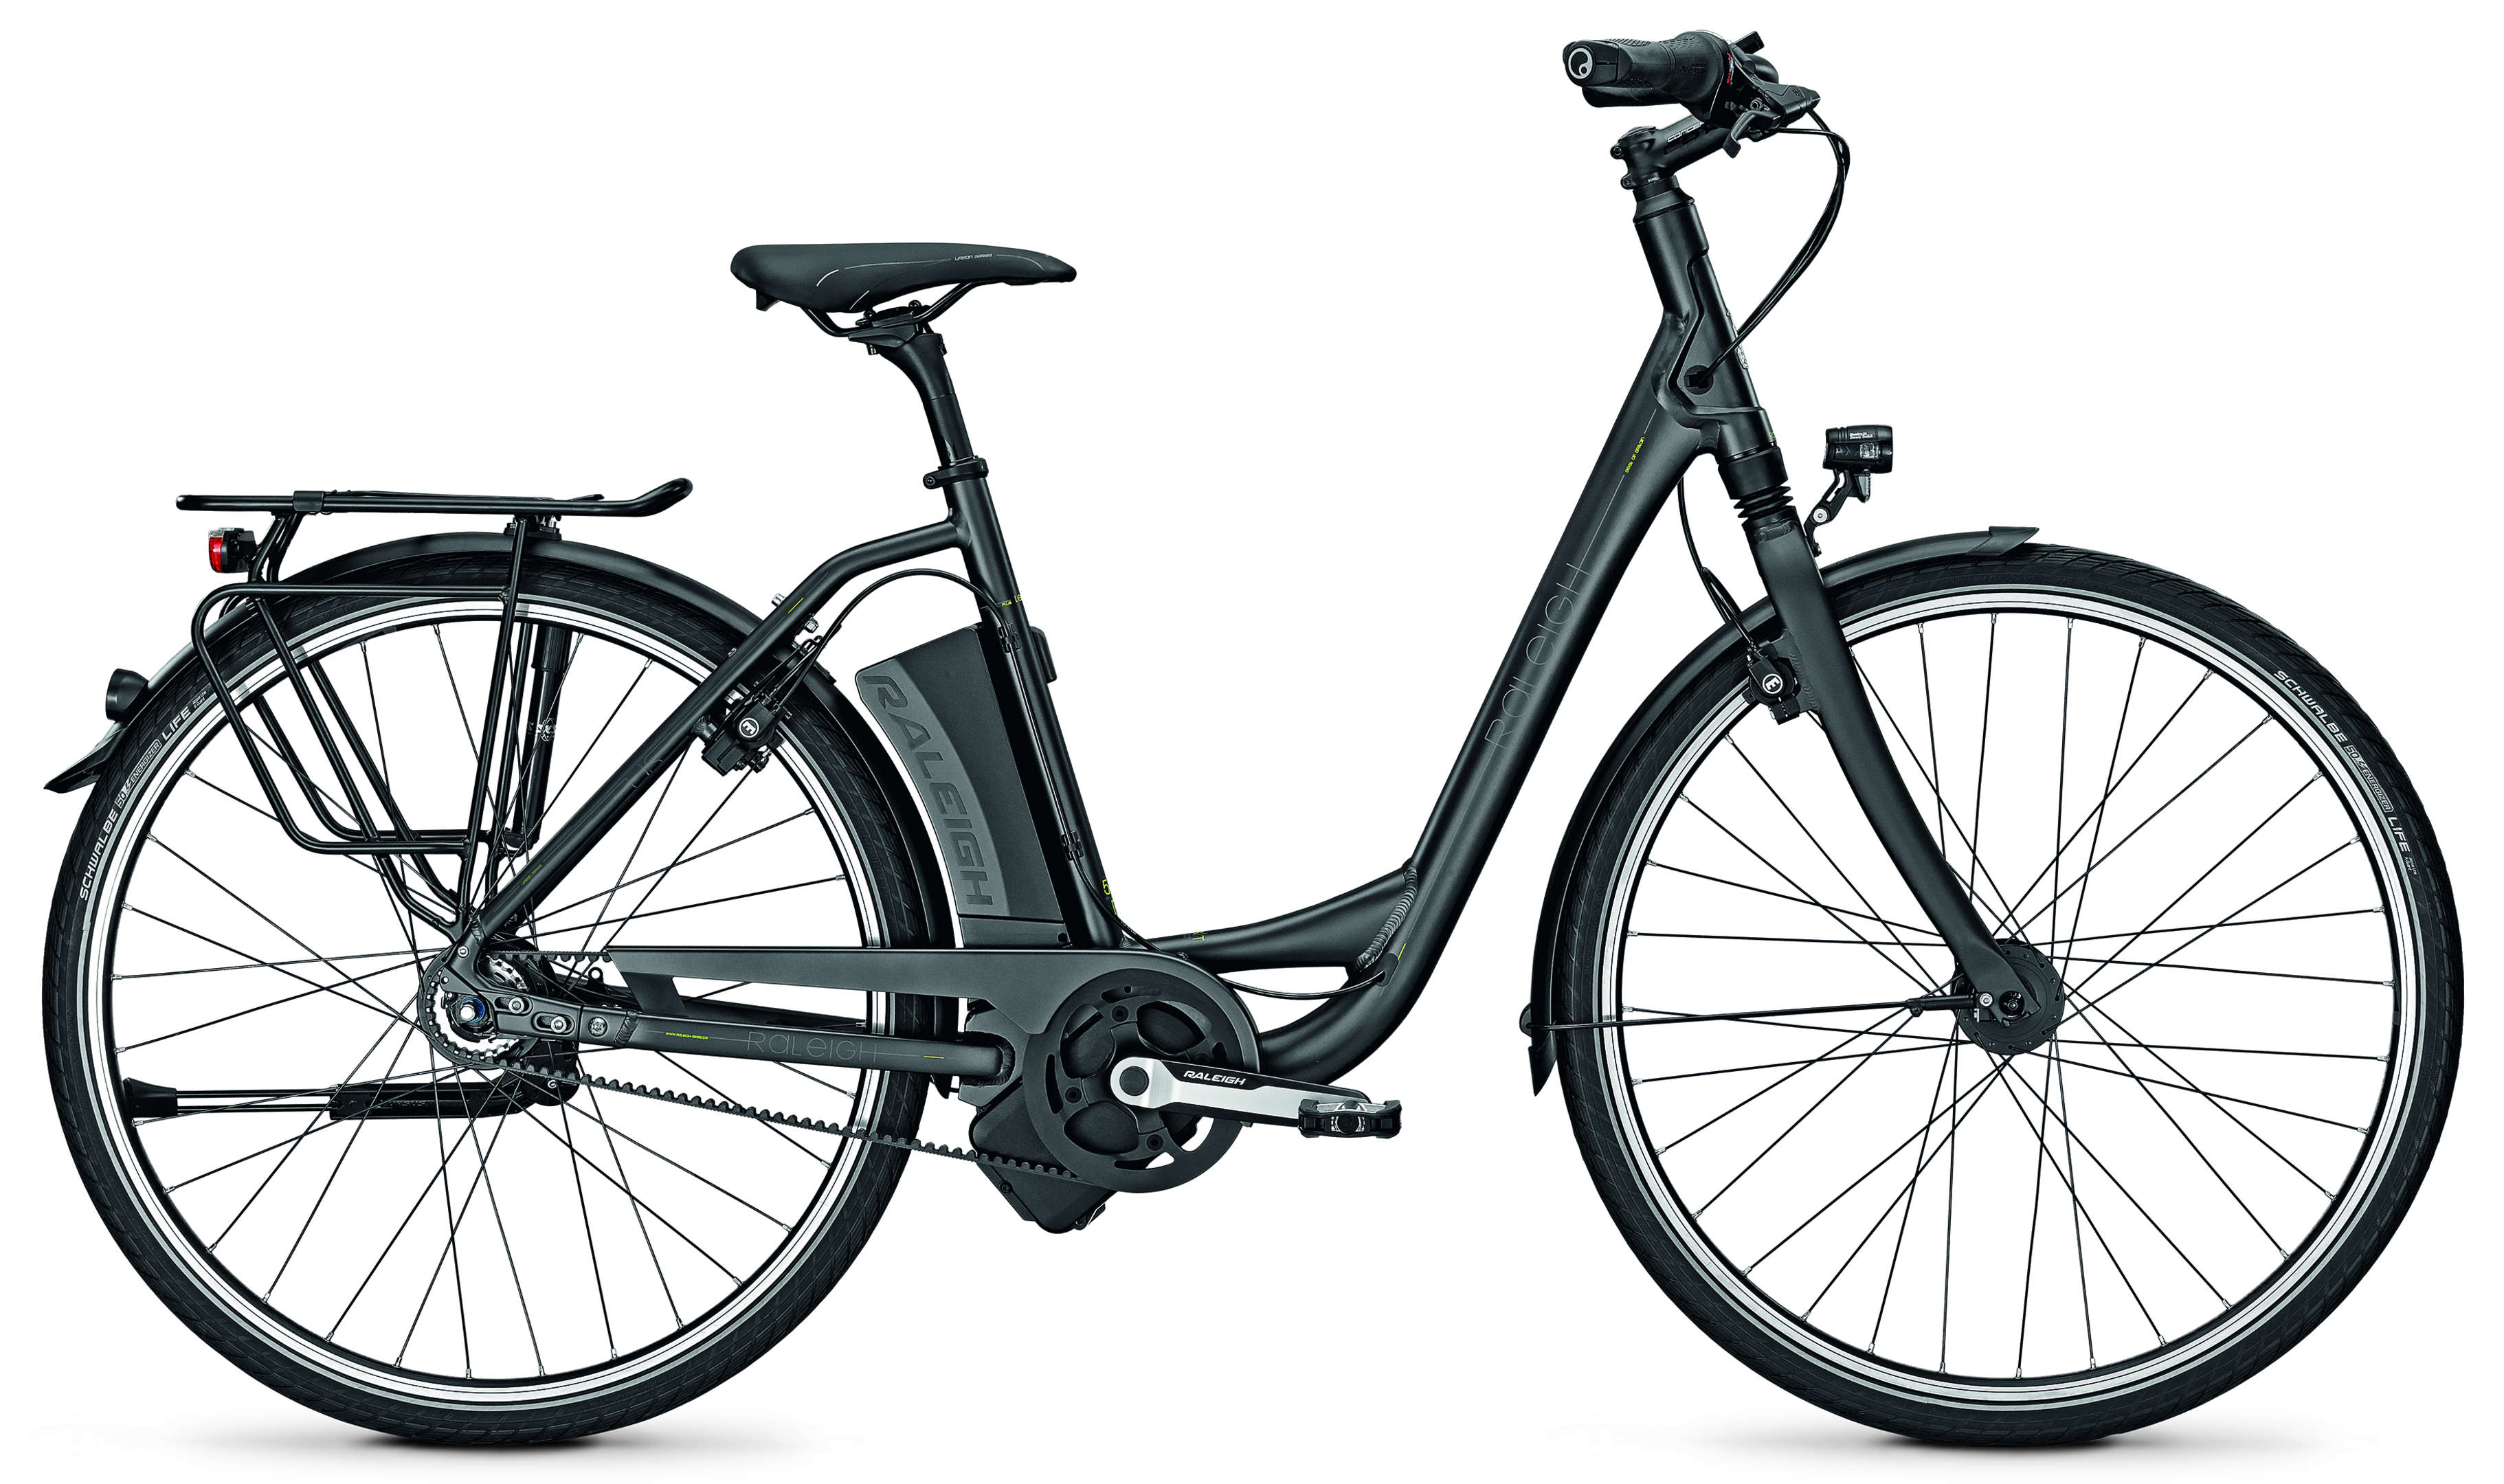 raleigh e bike leeds plus eurorad bikeleasingeurorad bikeleasing. Black Bedroom Furniture Sets. Home Design Ideas